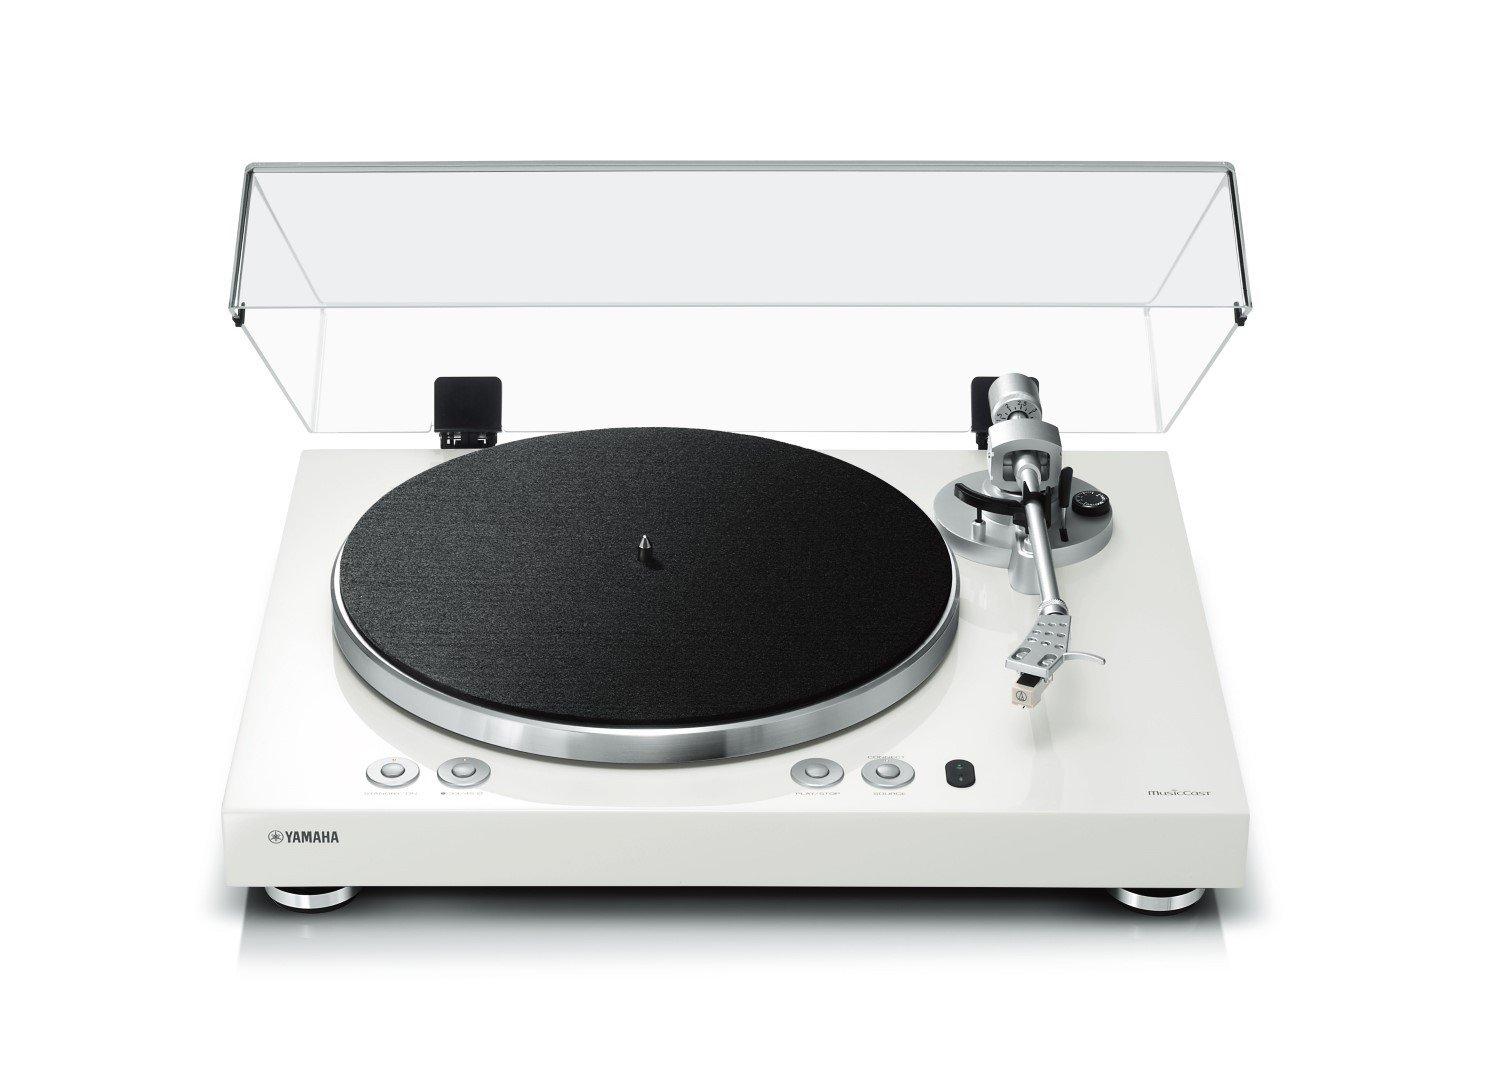 yamaha musiccast vinyl 500 levysoitin toimitus 0. Black Bedroom Furniture Sets. Home Design Ideas